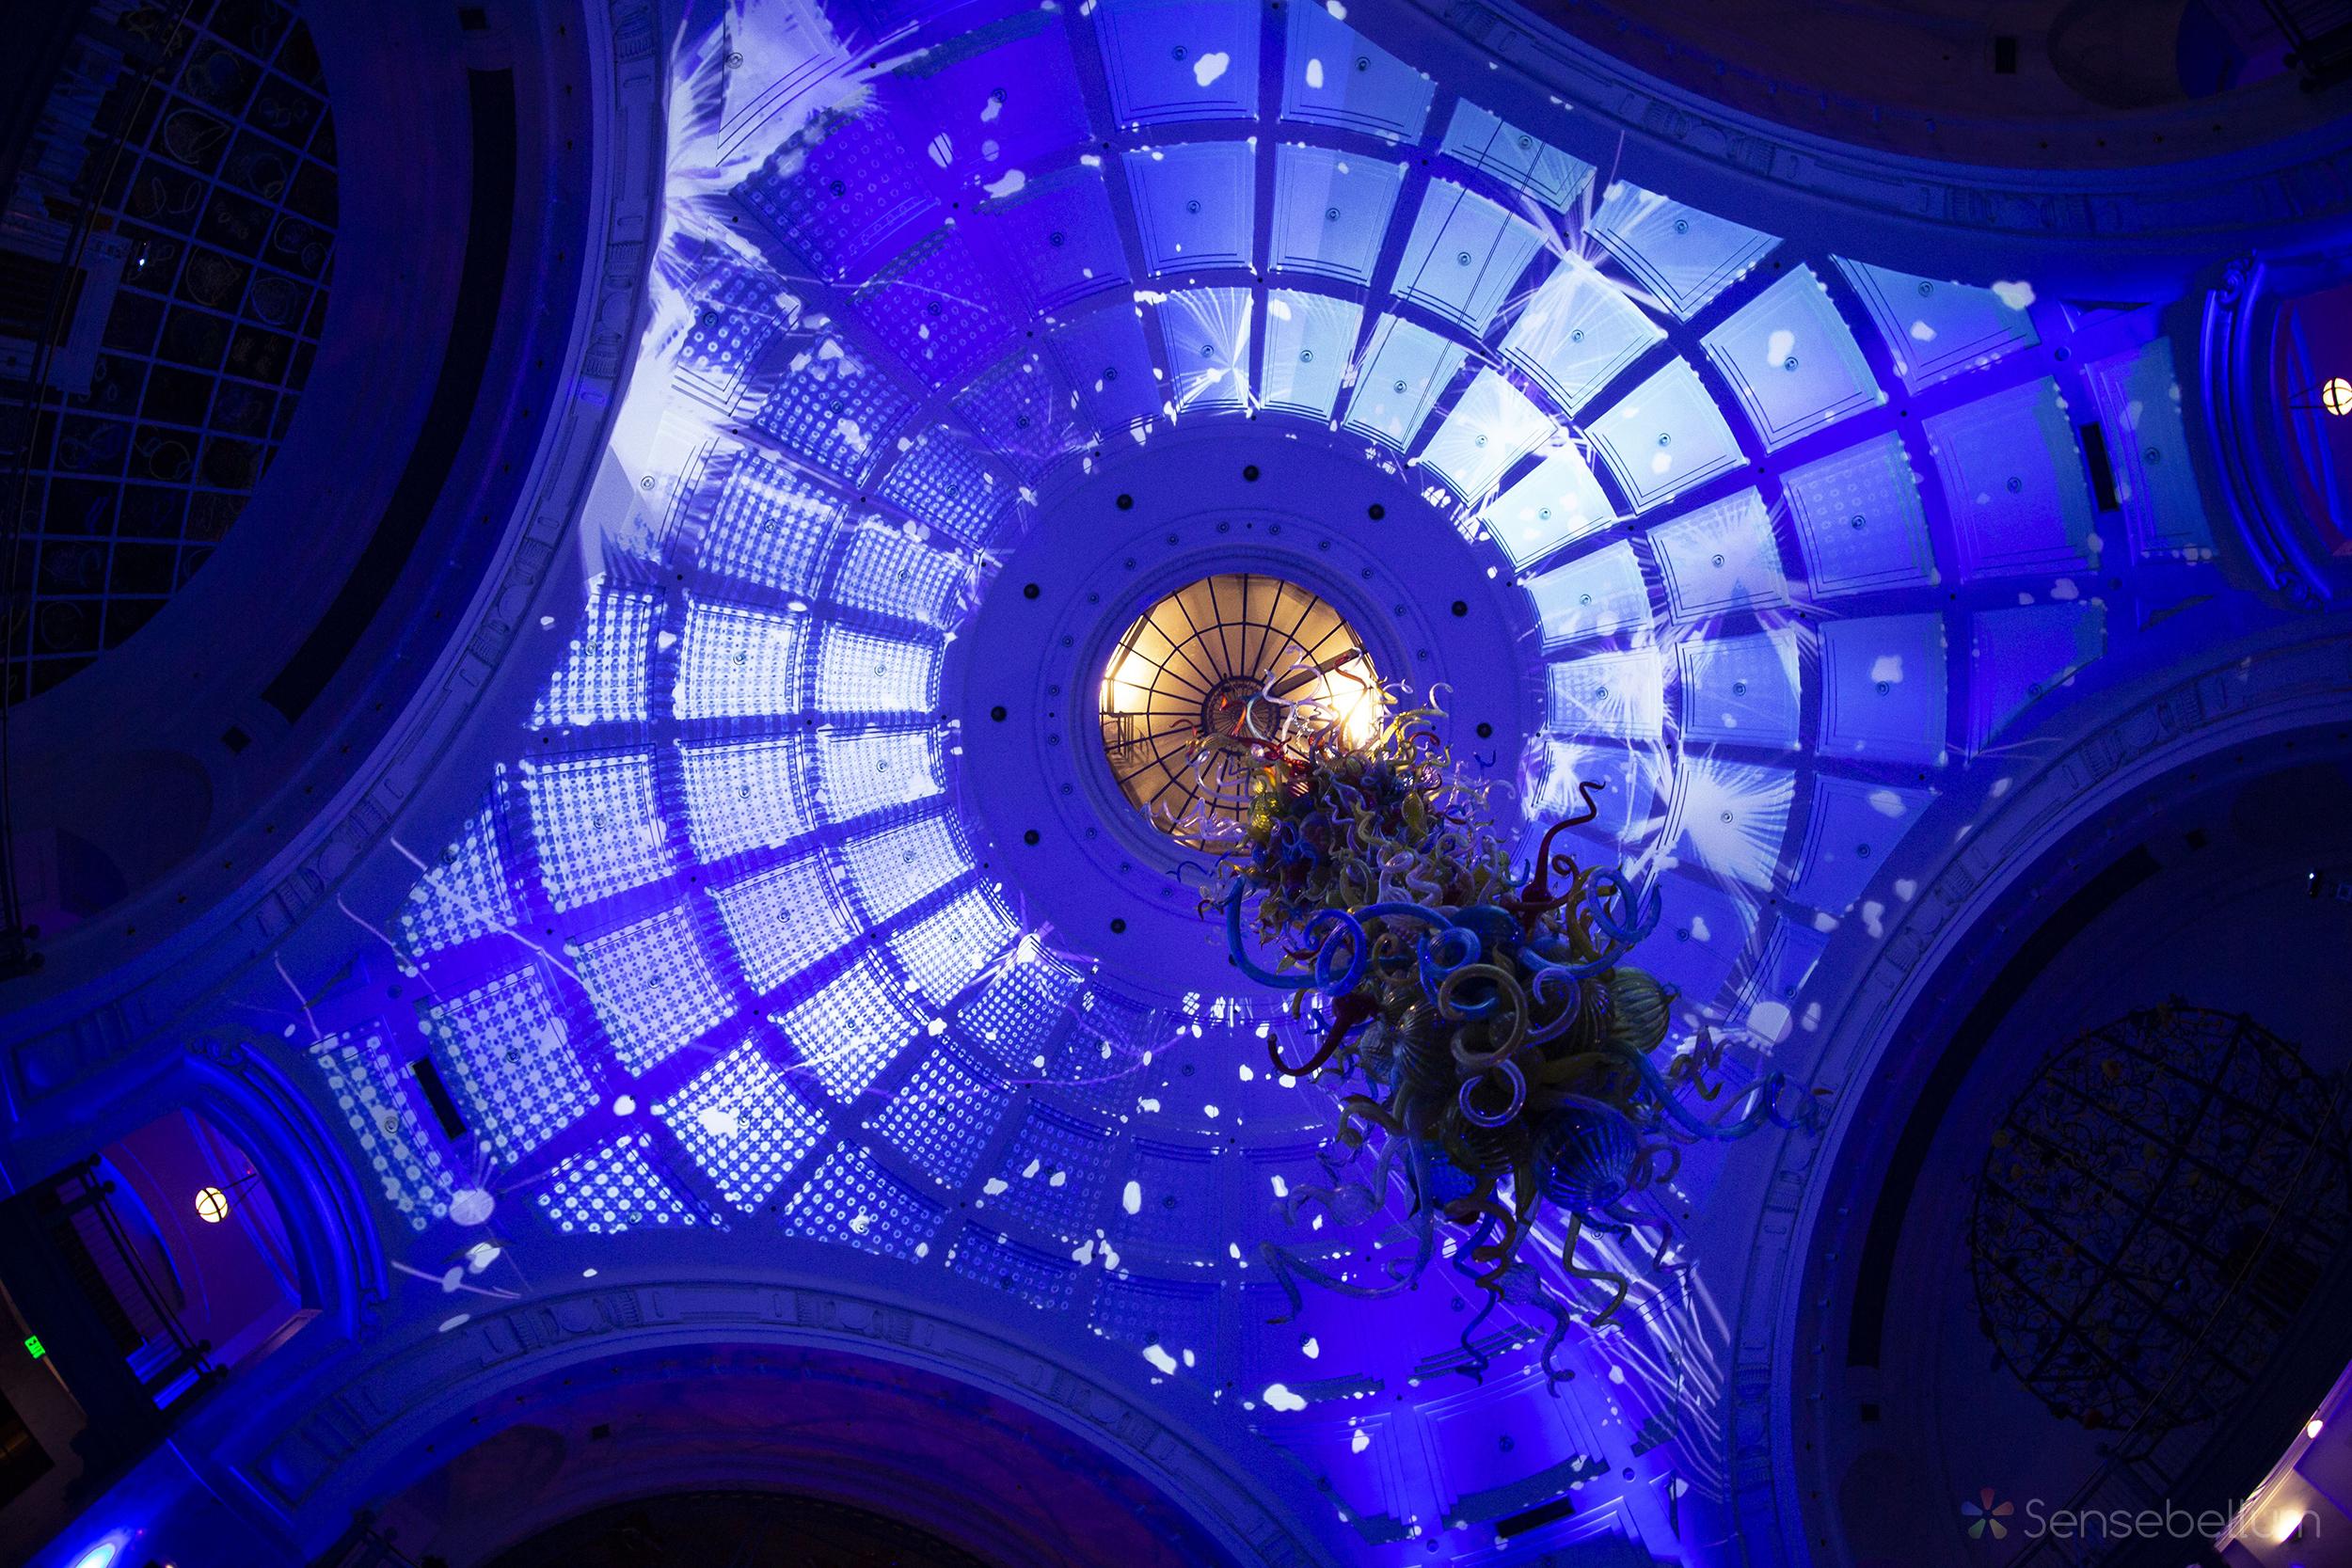 Sensebellum Tacoma Union Station Projection Mapping Wedding Event Lighting 360 Video Light Art Seattle 66 copy.jpg